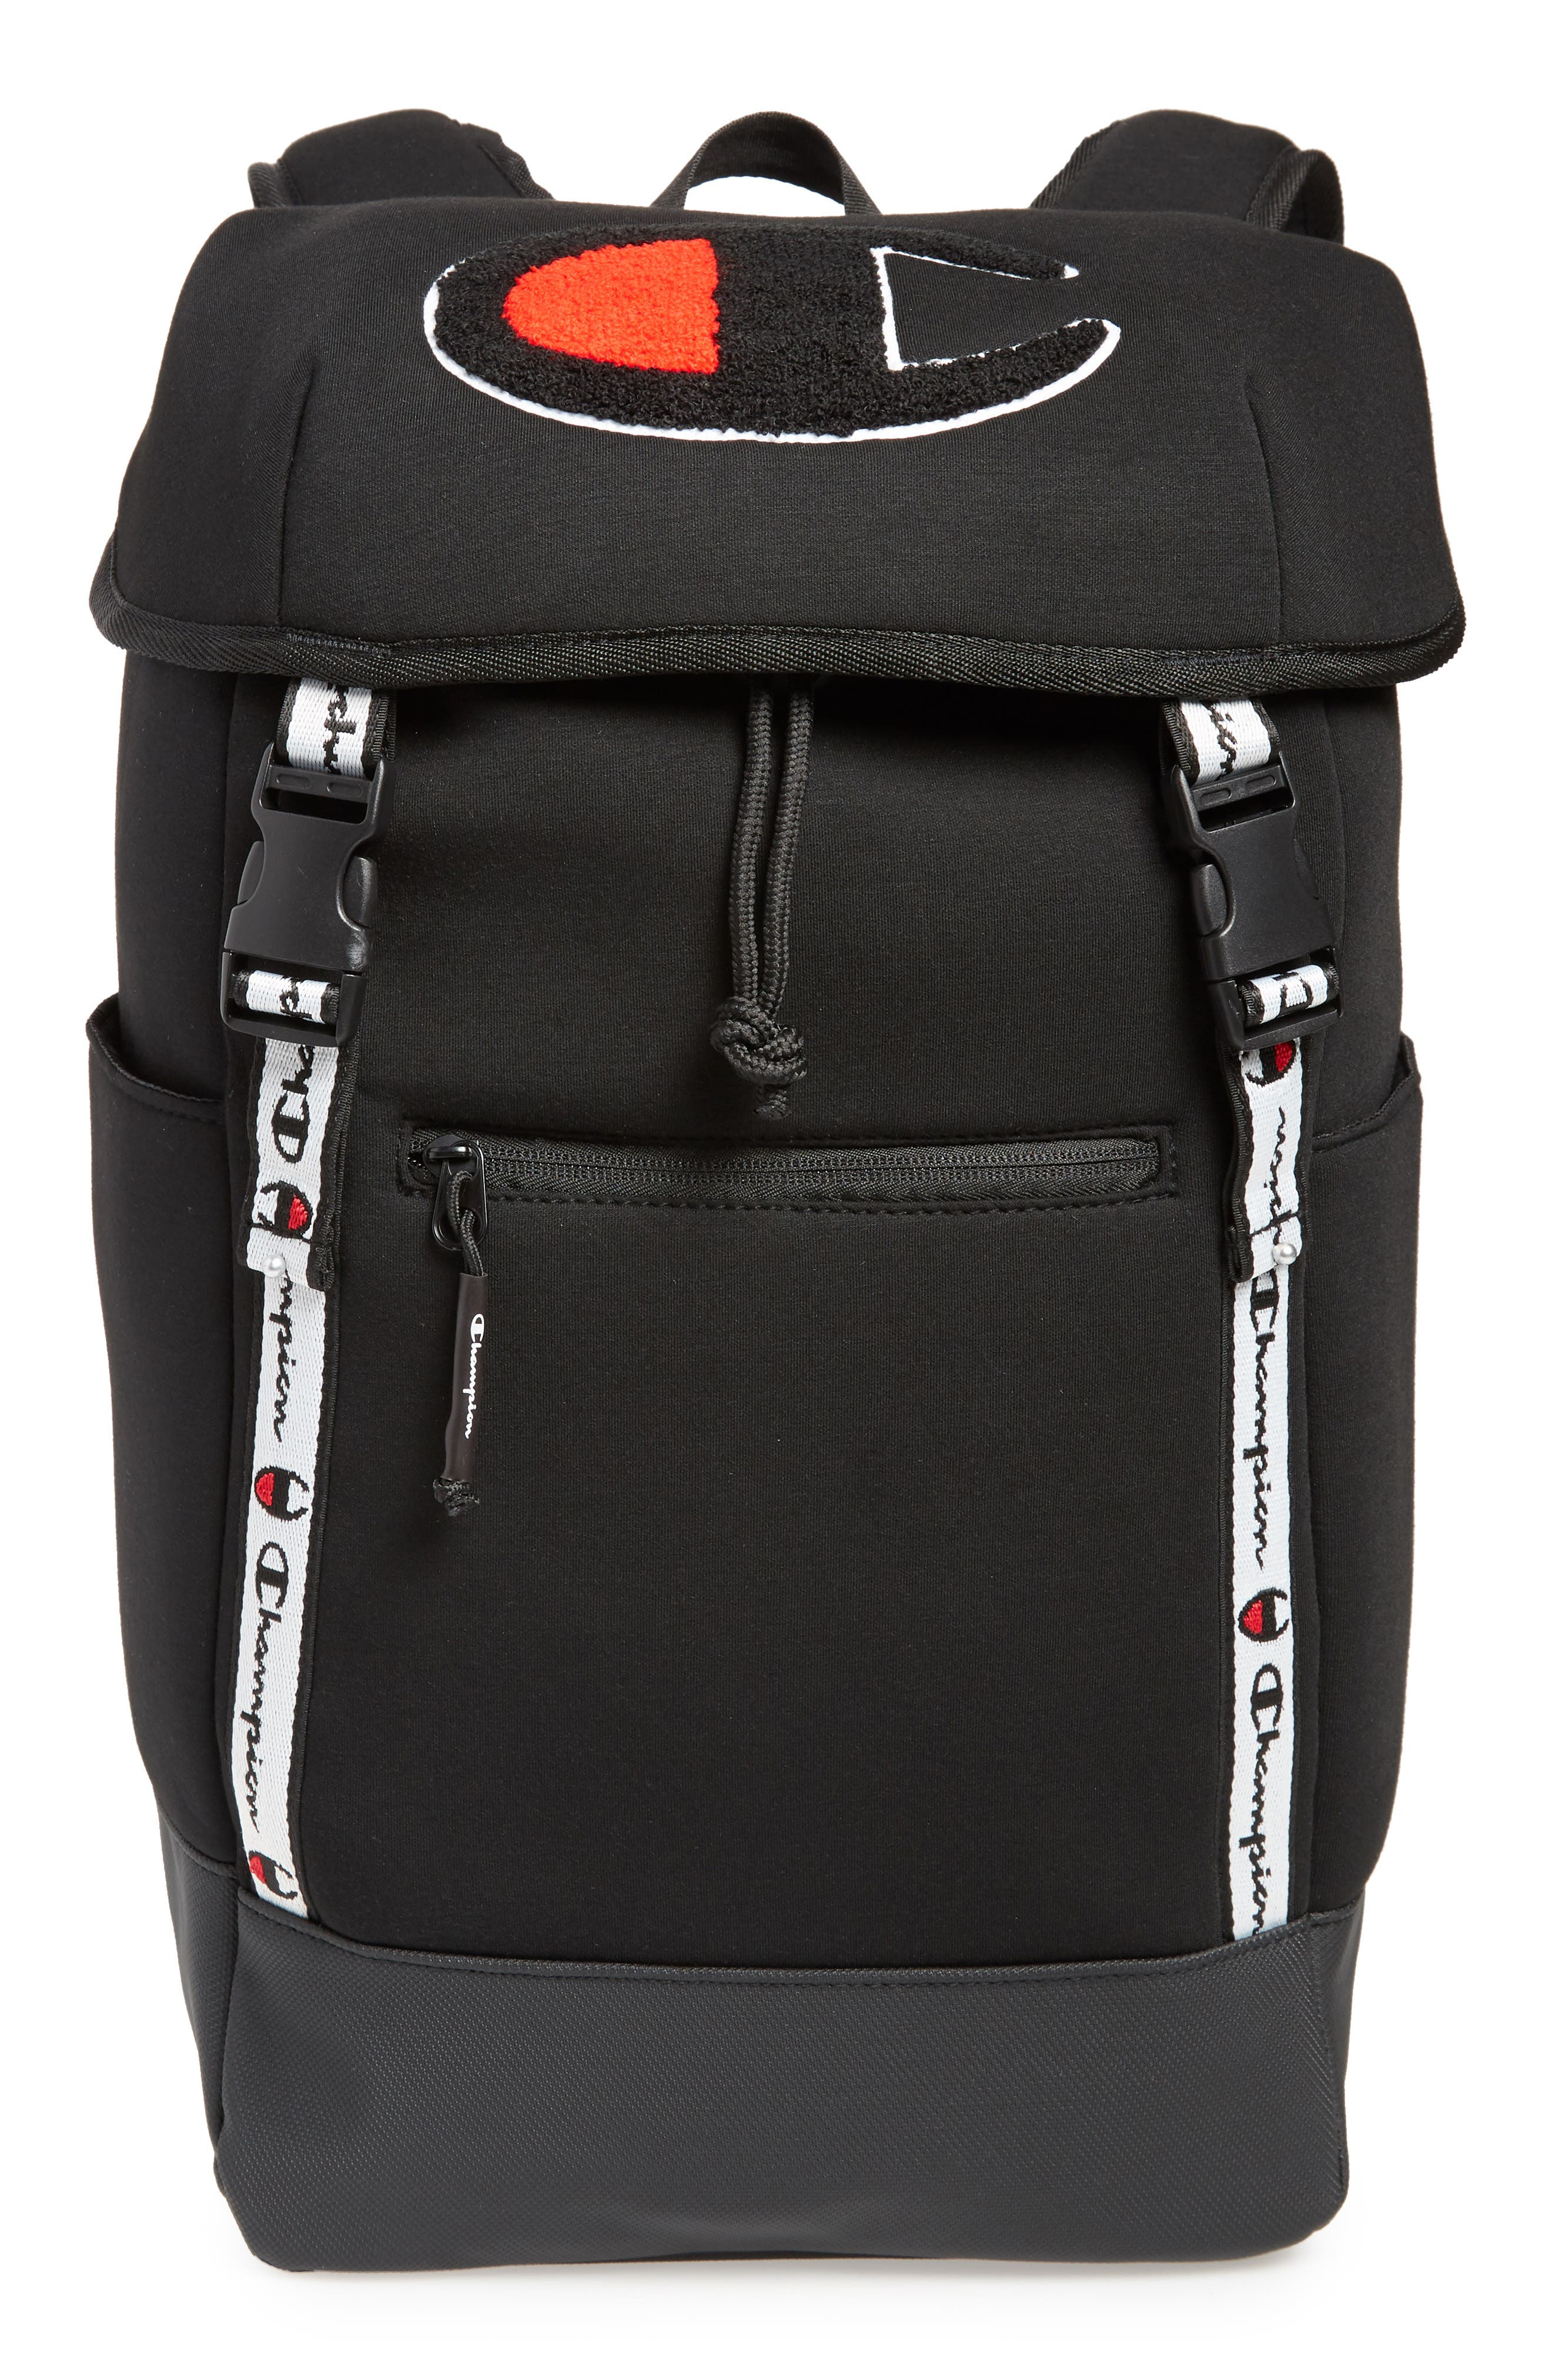 Top Load Backpack,                             Main thumbnail 1, color,                             BLACK